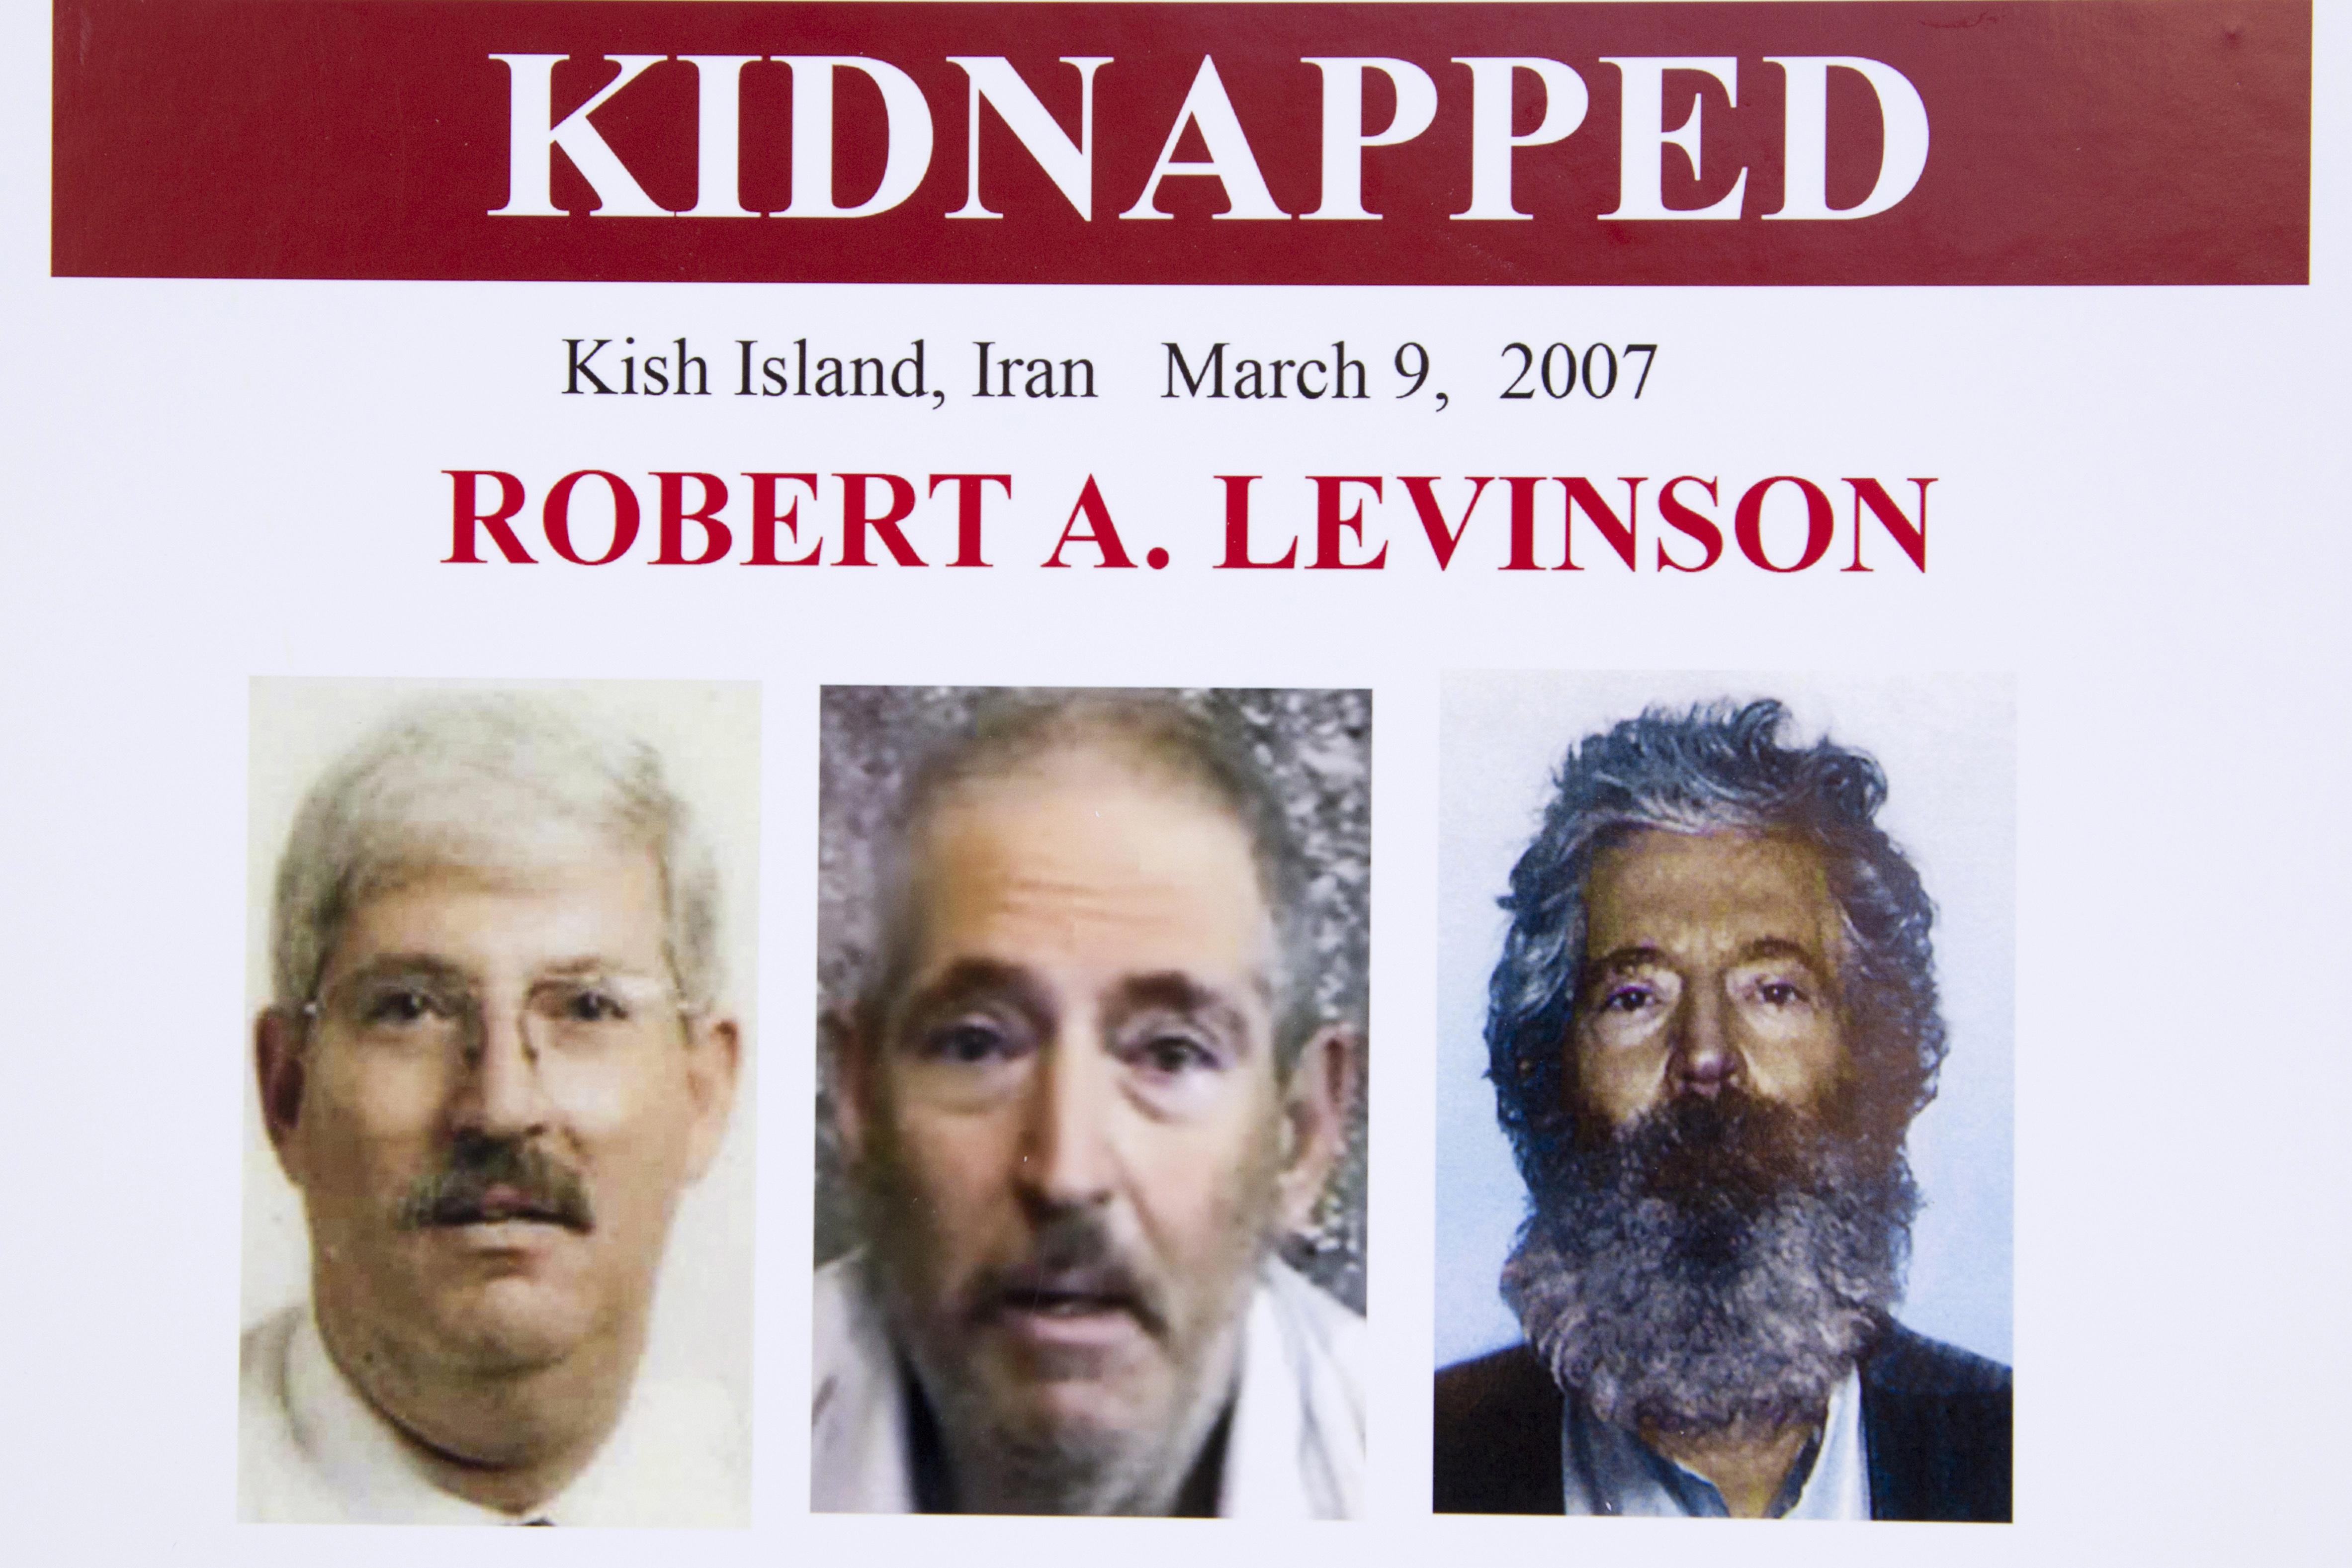 US court: Iran owes $1.4B over ex-FBI agent presumed dead